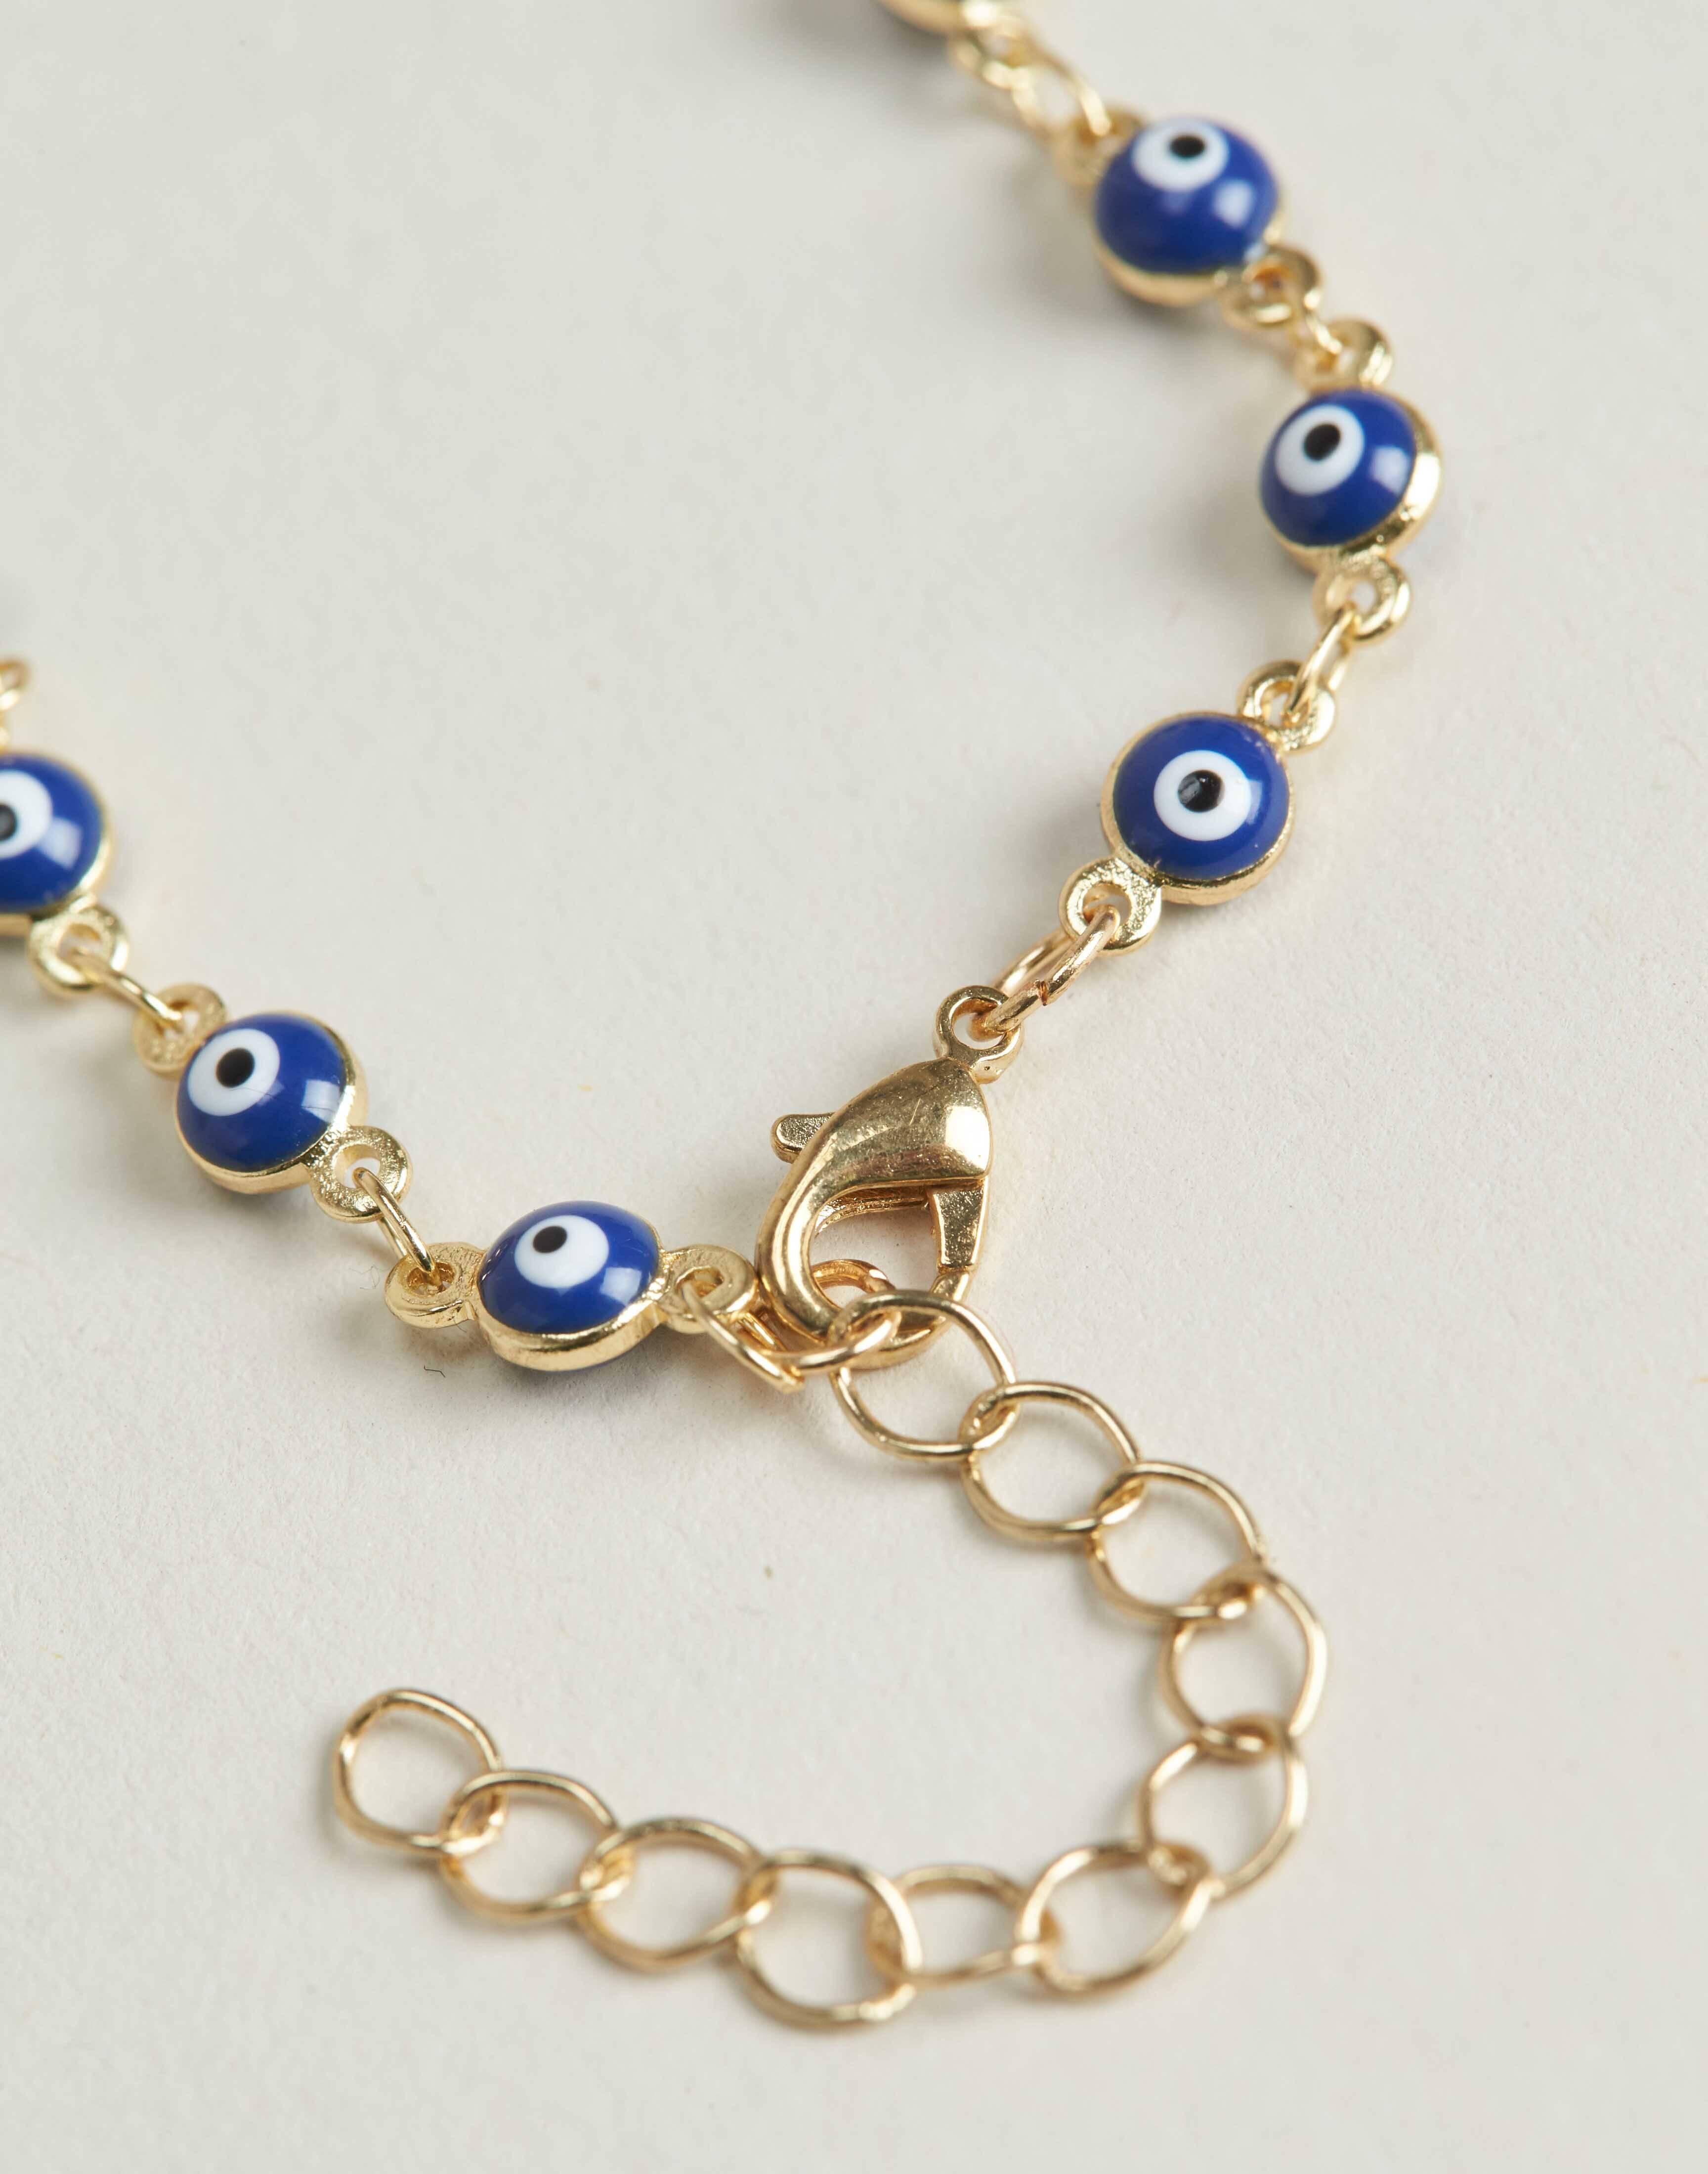 Turkish eyes bracelet